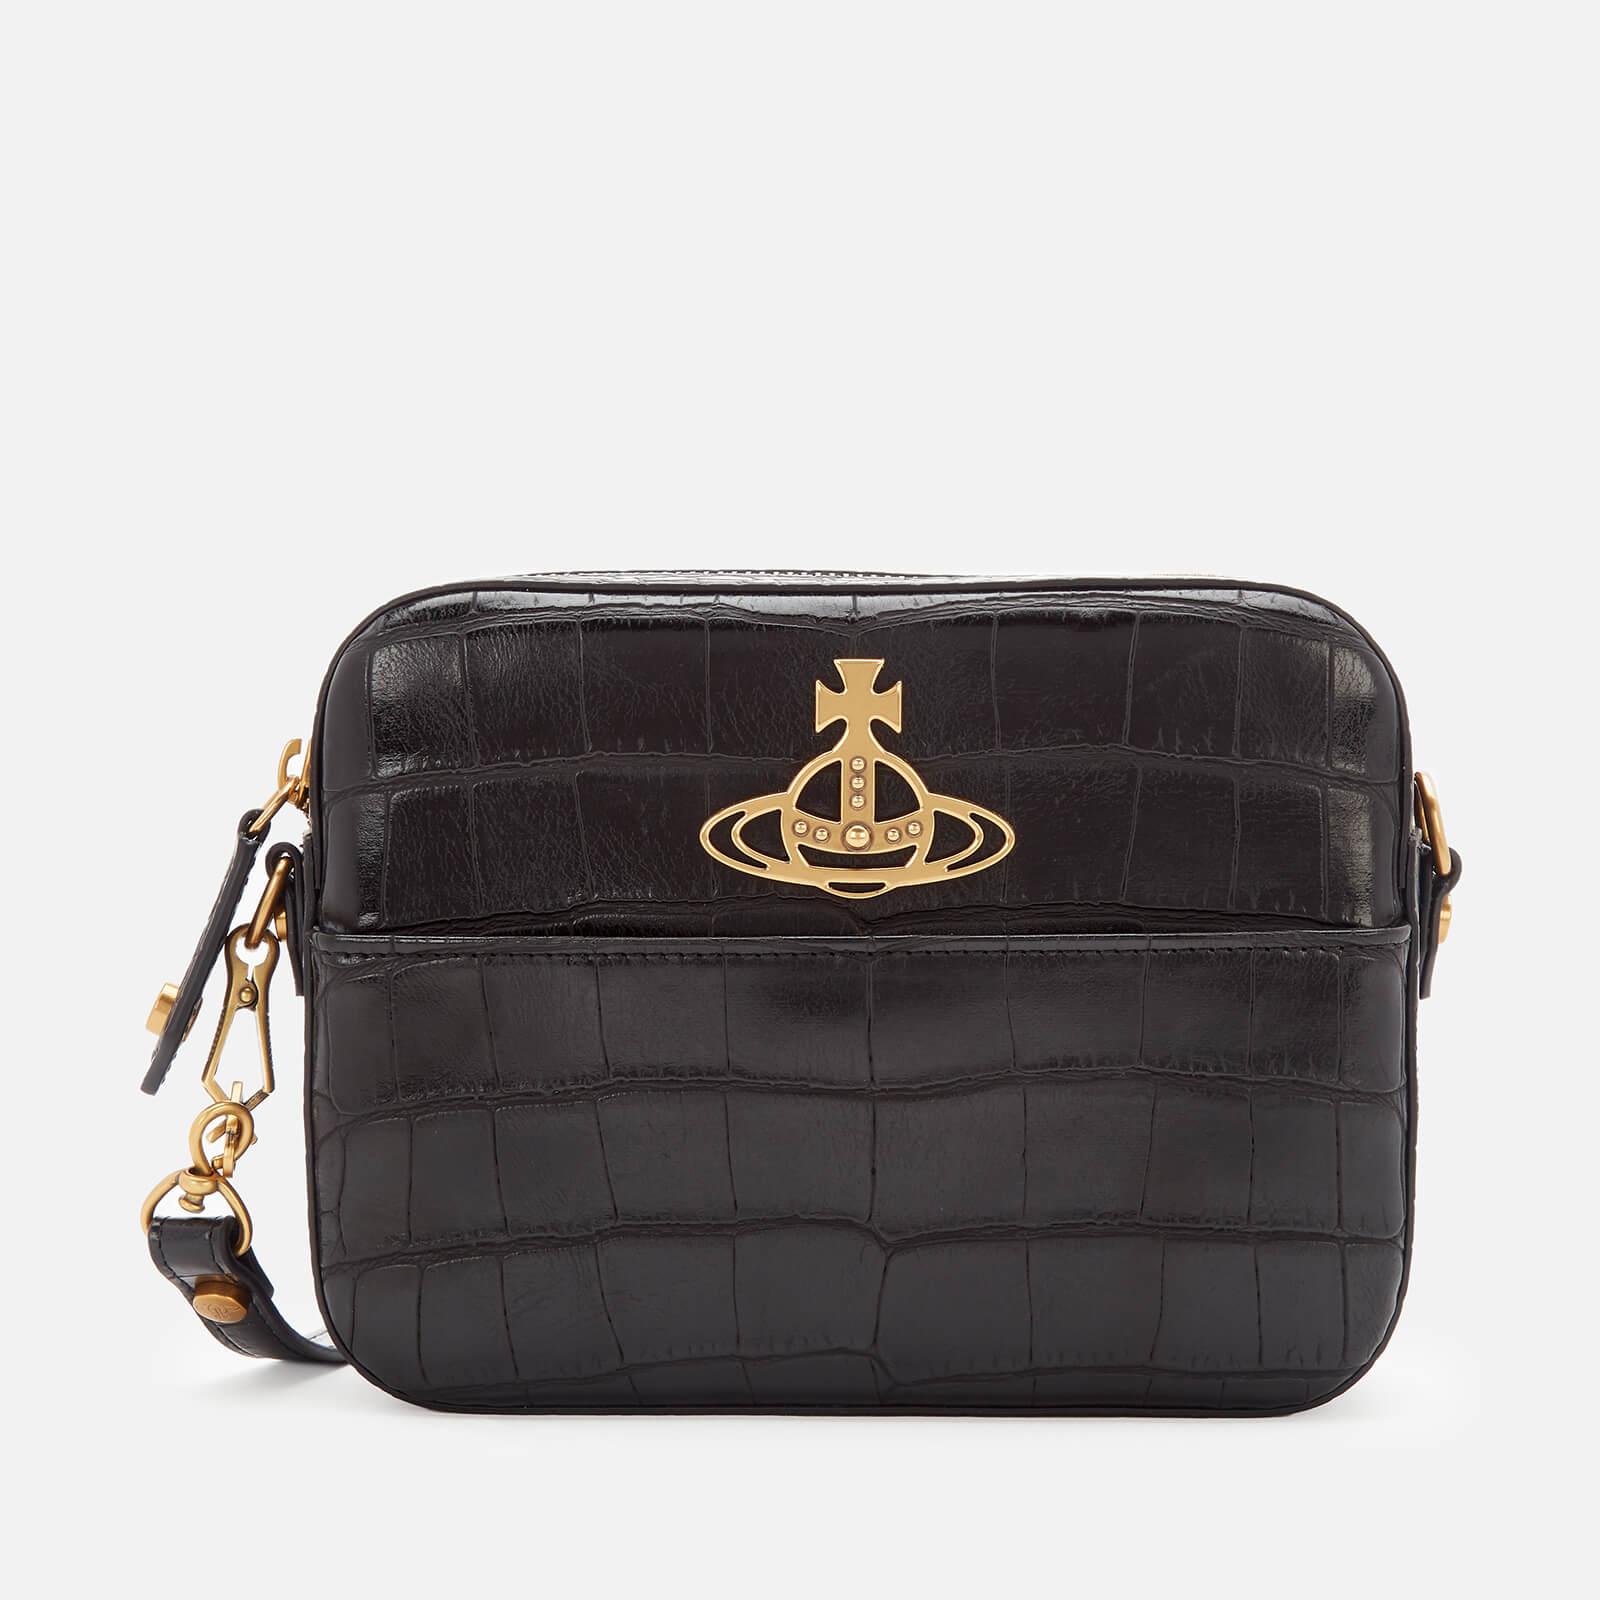 Vivienne Westwood Women's Johanna Croc Cross Body Bag - Black